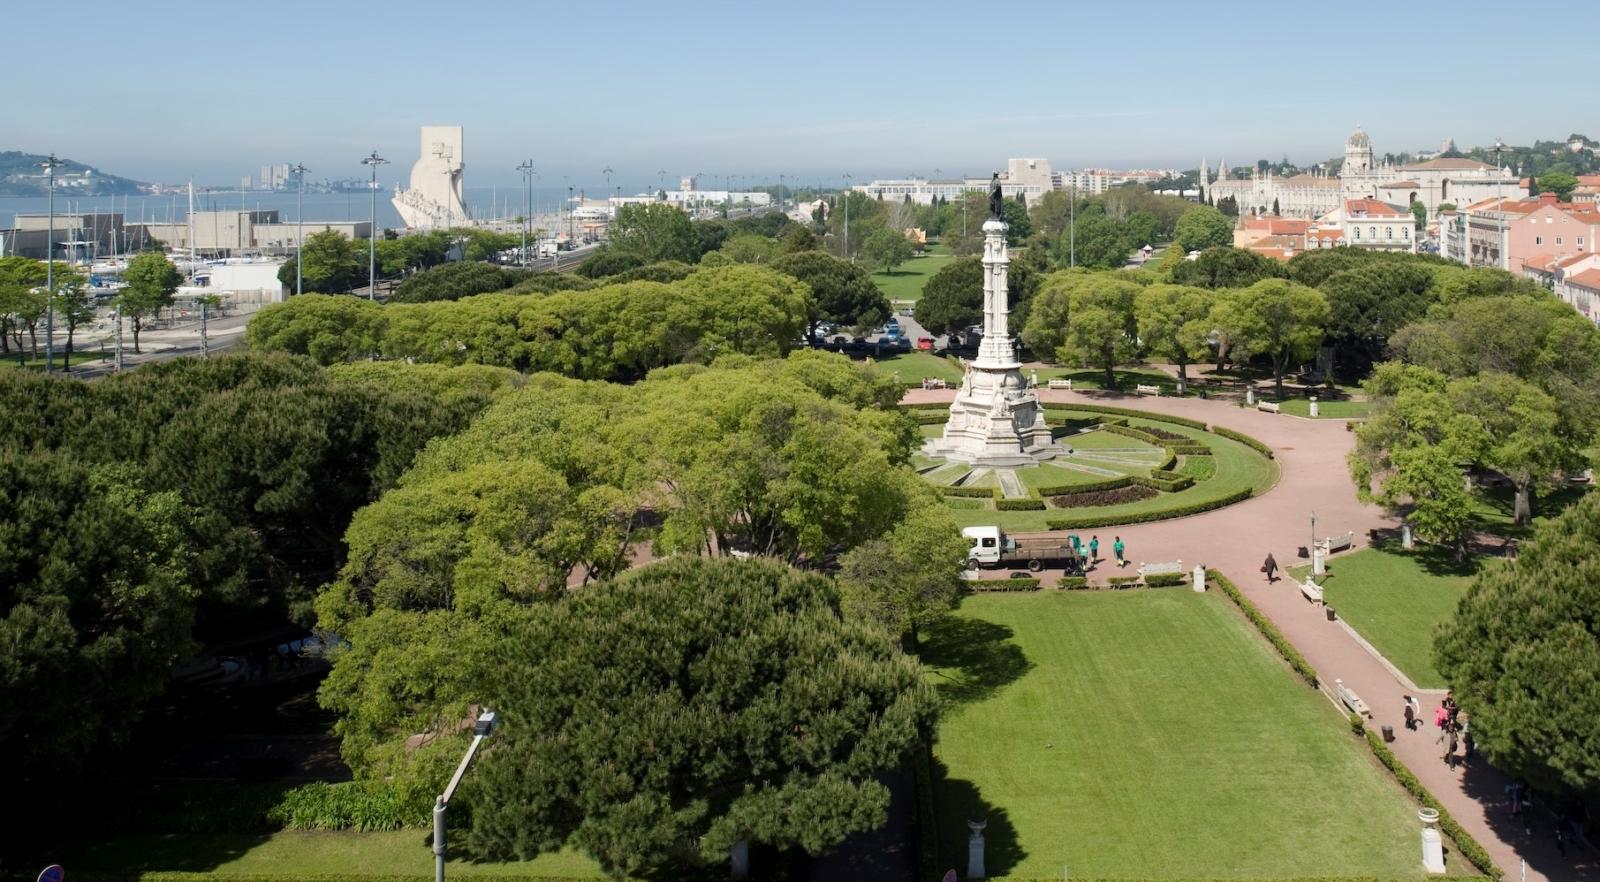 Vista aérea de Belém